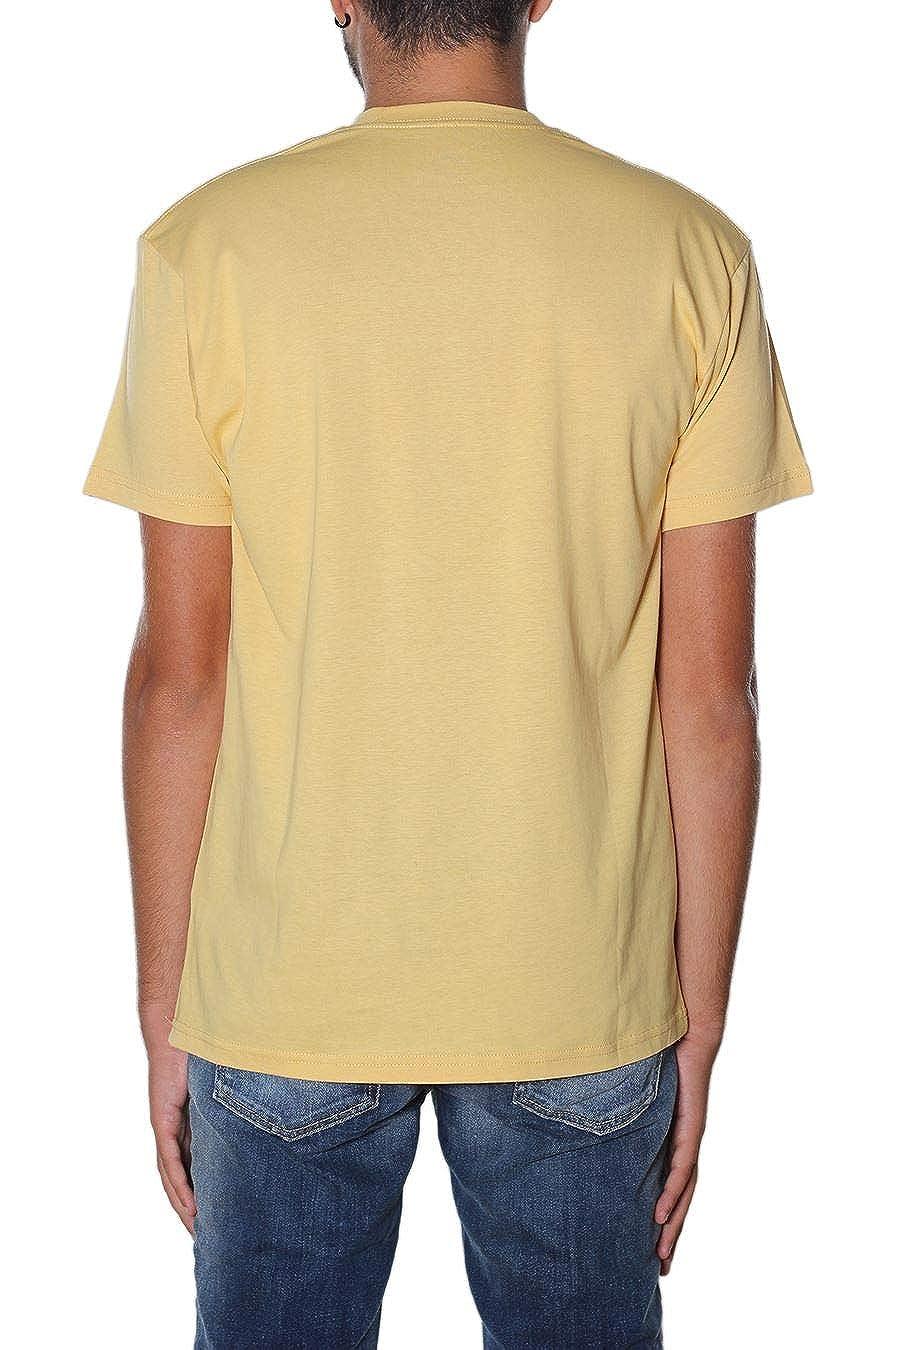 315a400e7c9d67 Amazon.com  Vans Classic T-Shirt - New Wheat Dress Blues XL  Clothing